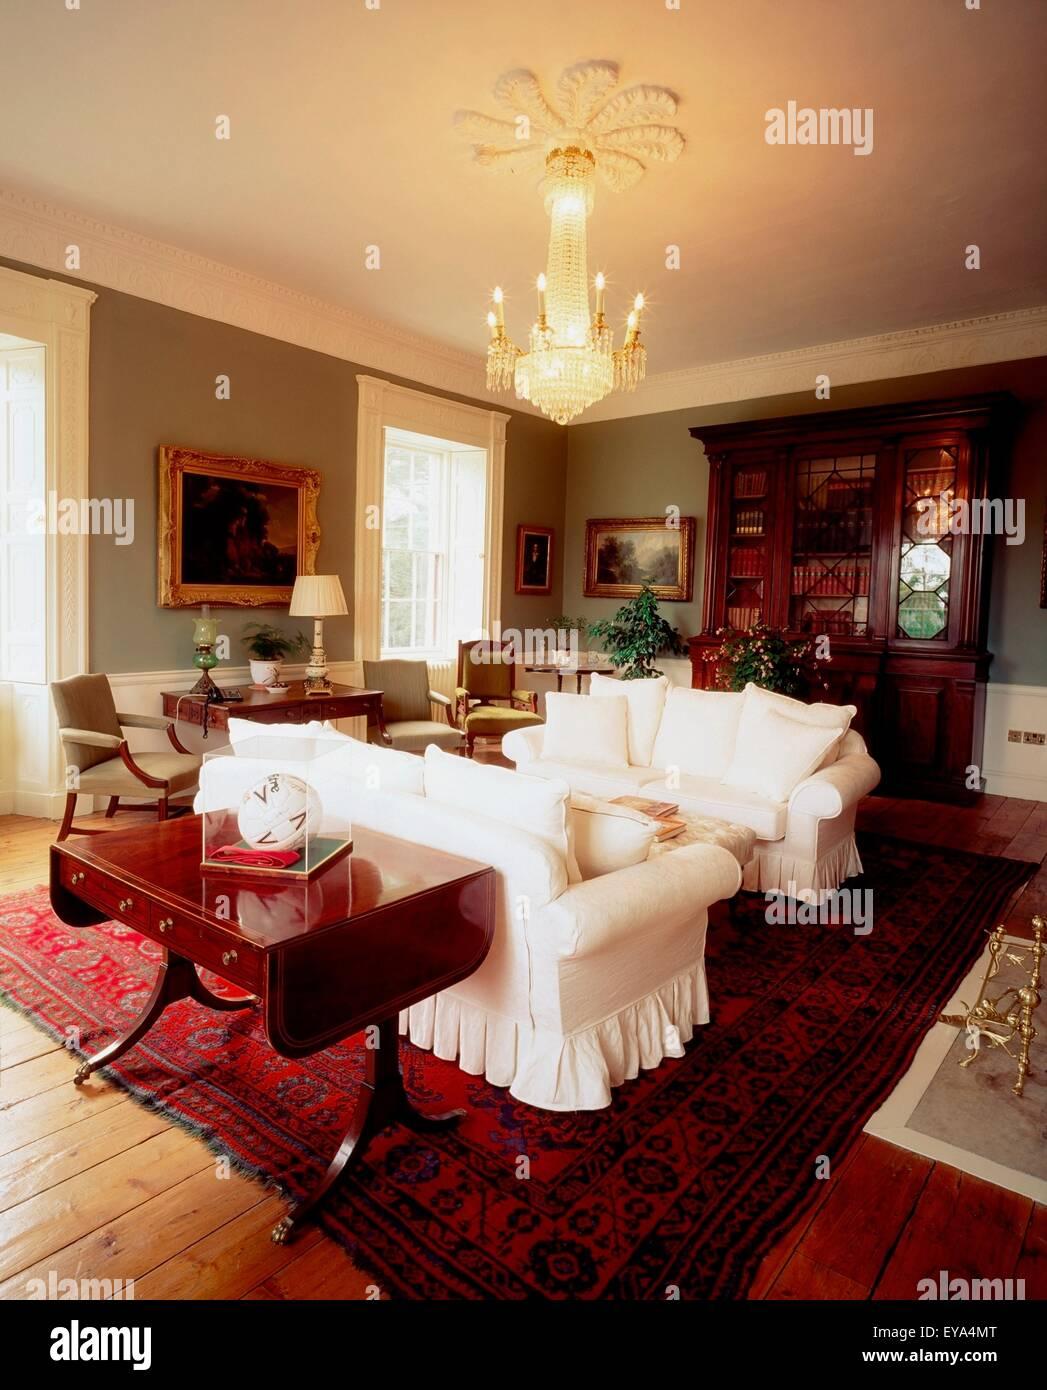 frybrook house boyle co roscommon ireland living room in an